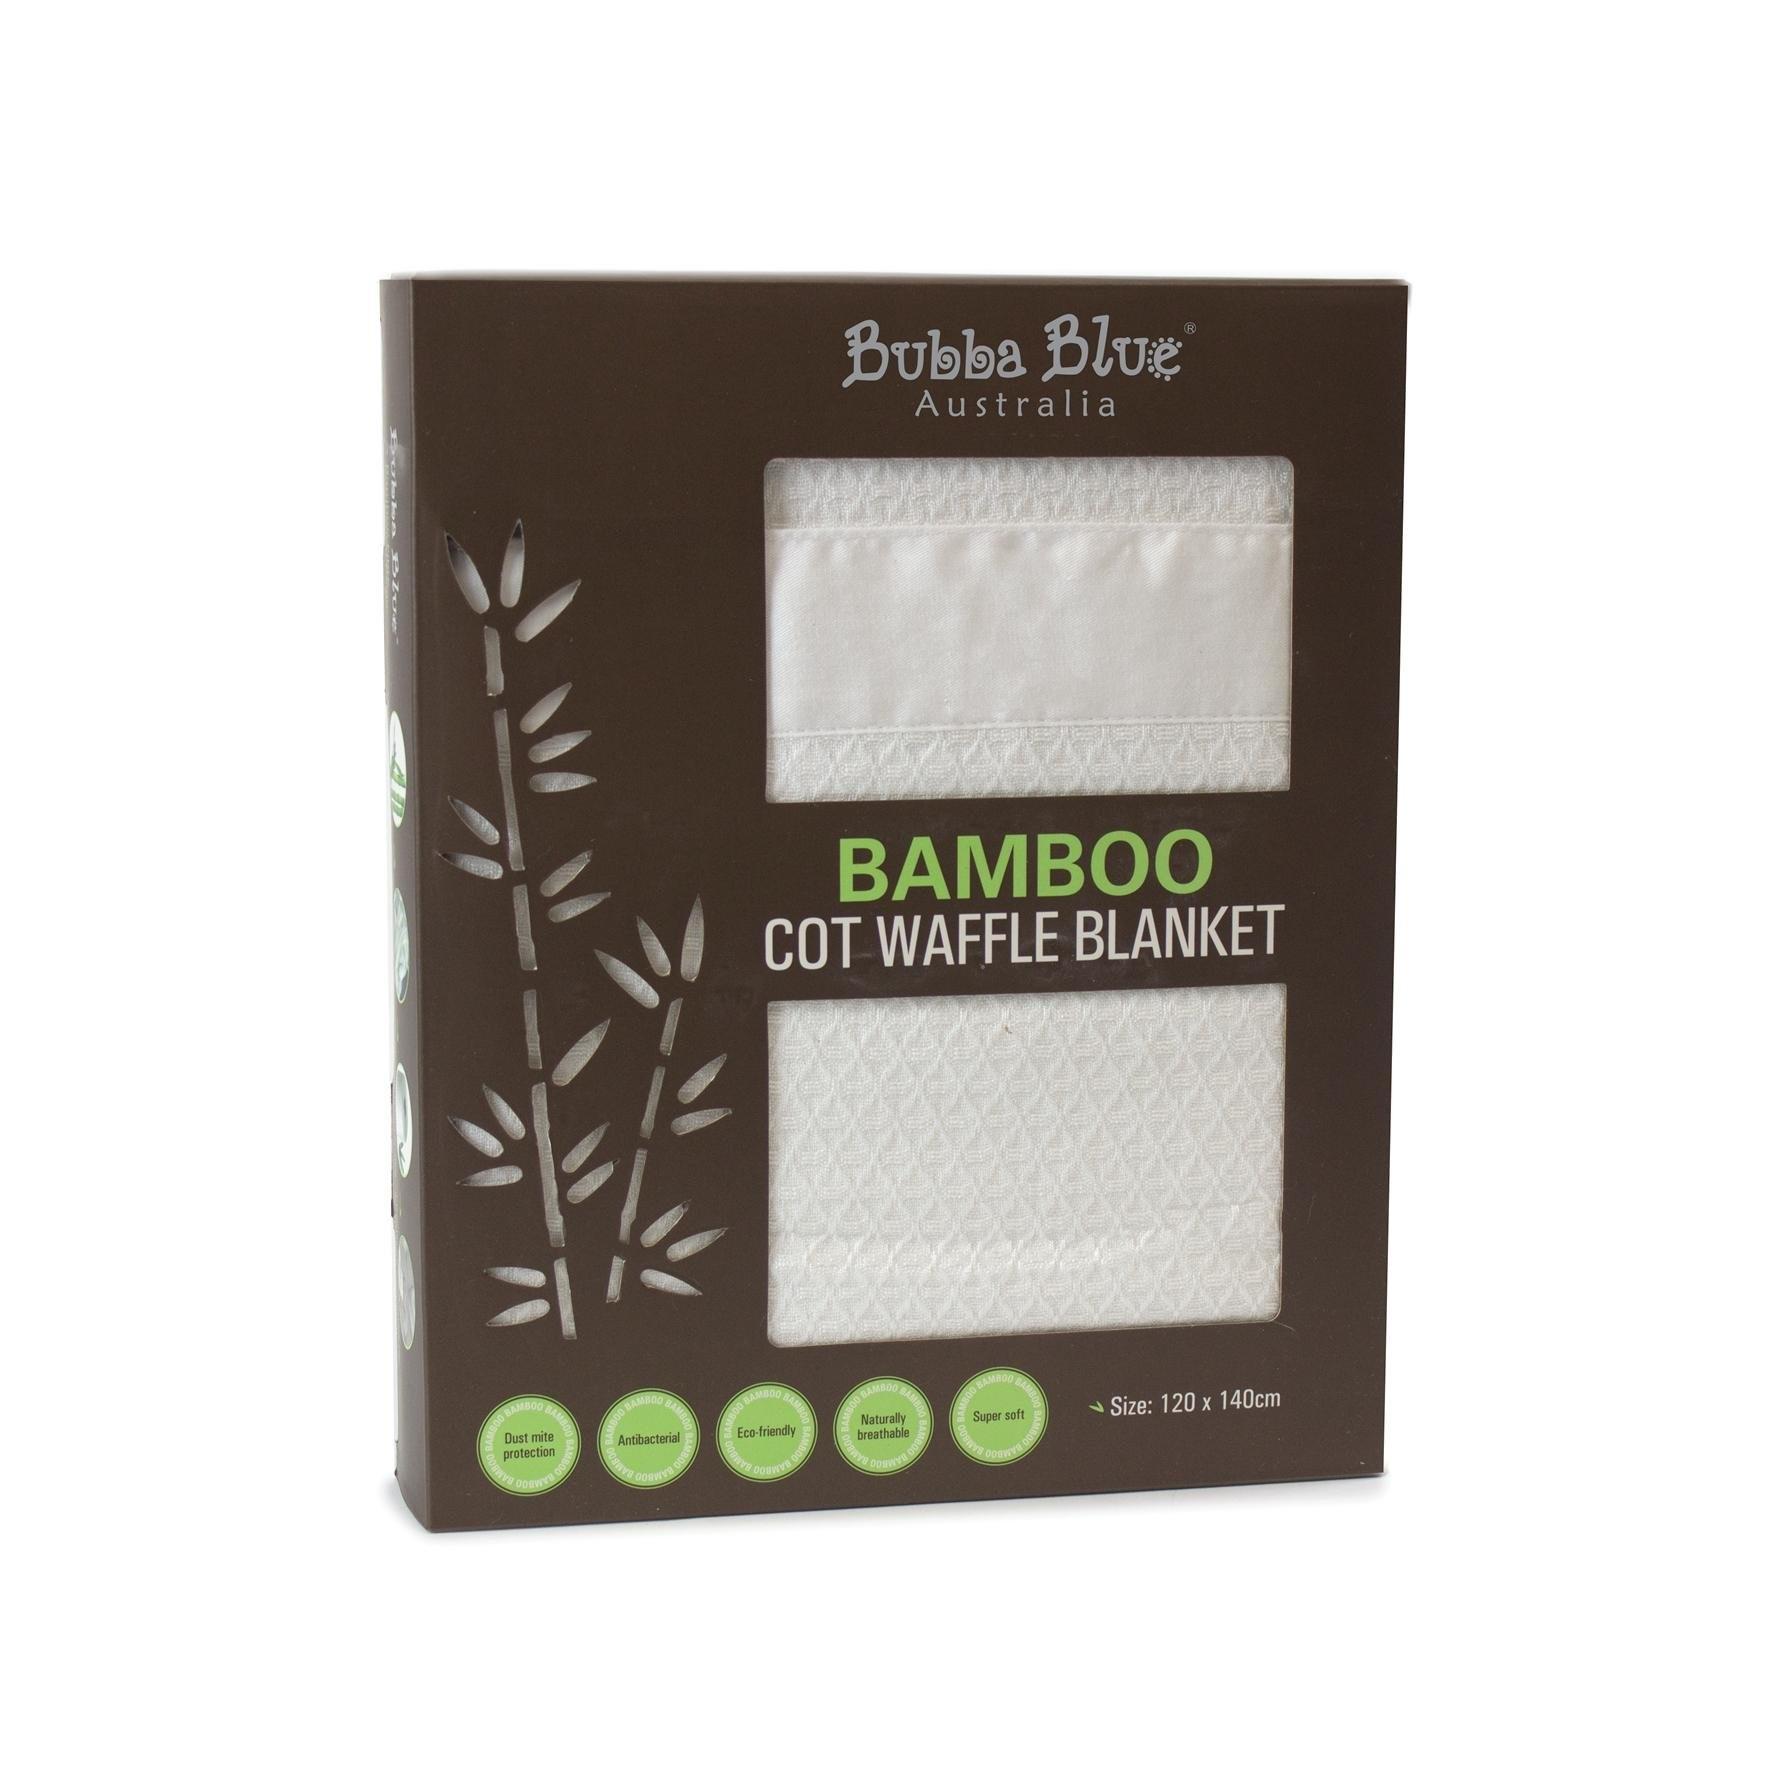 Bubba Blue Bamboo Cot Waffle Blanket